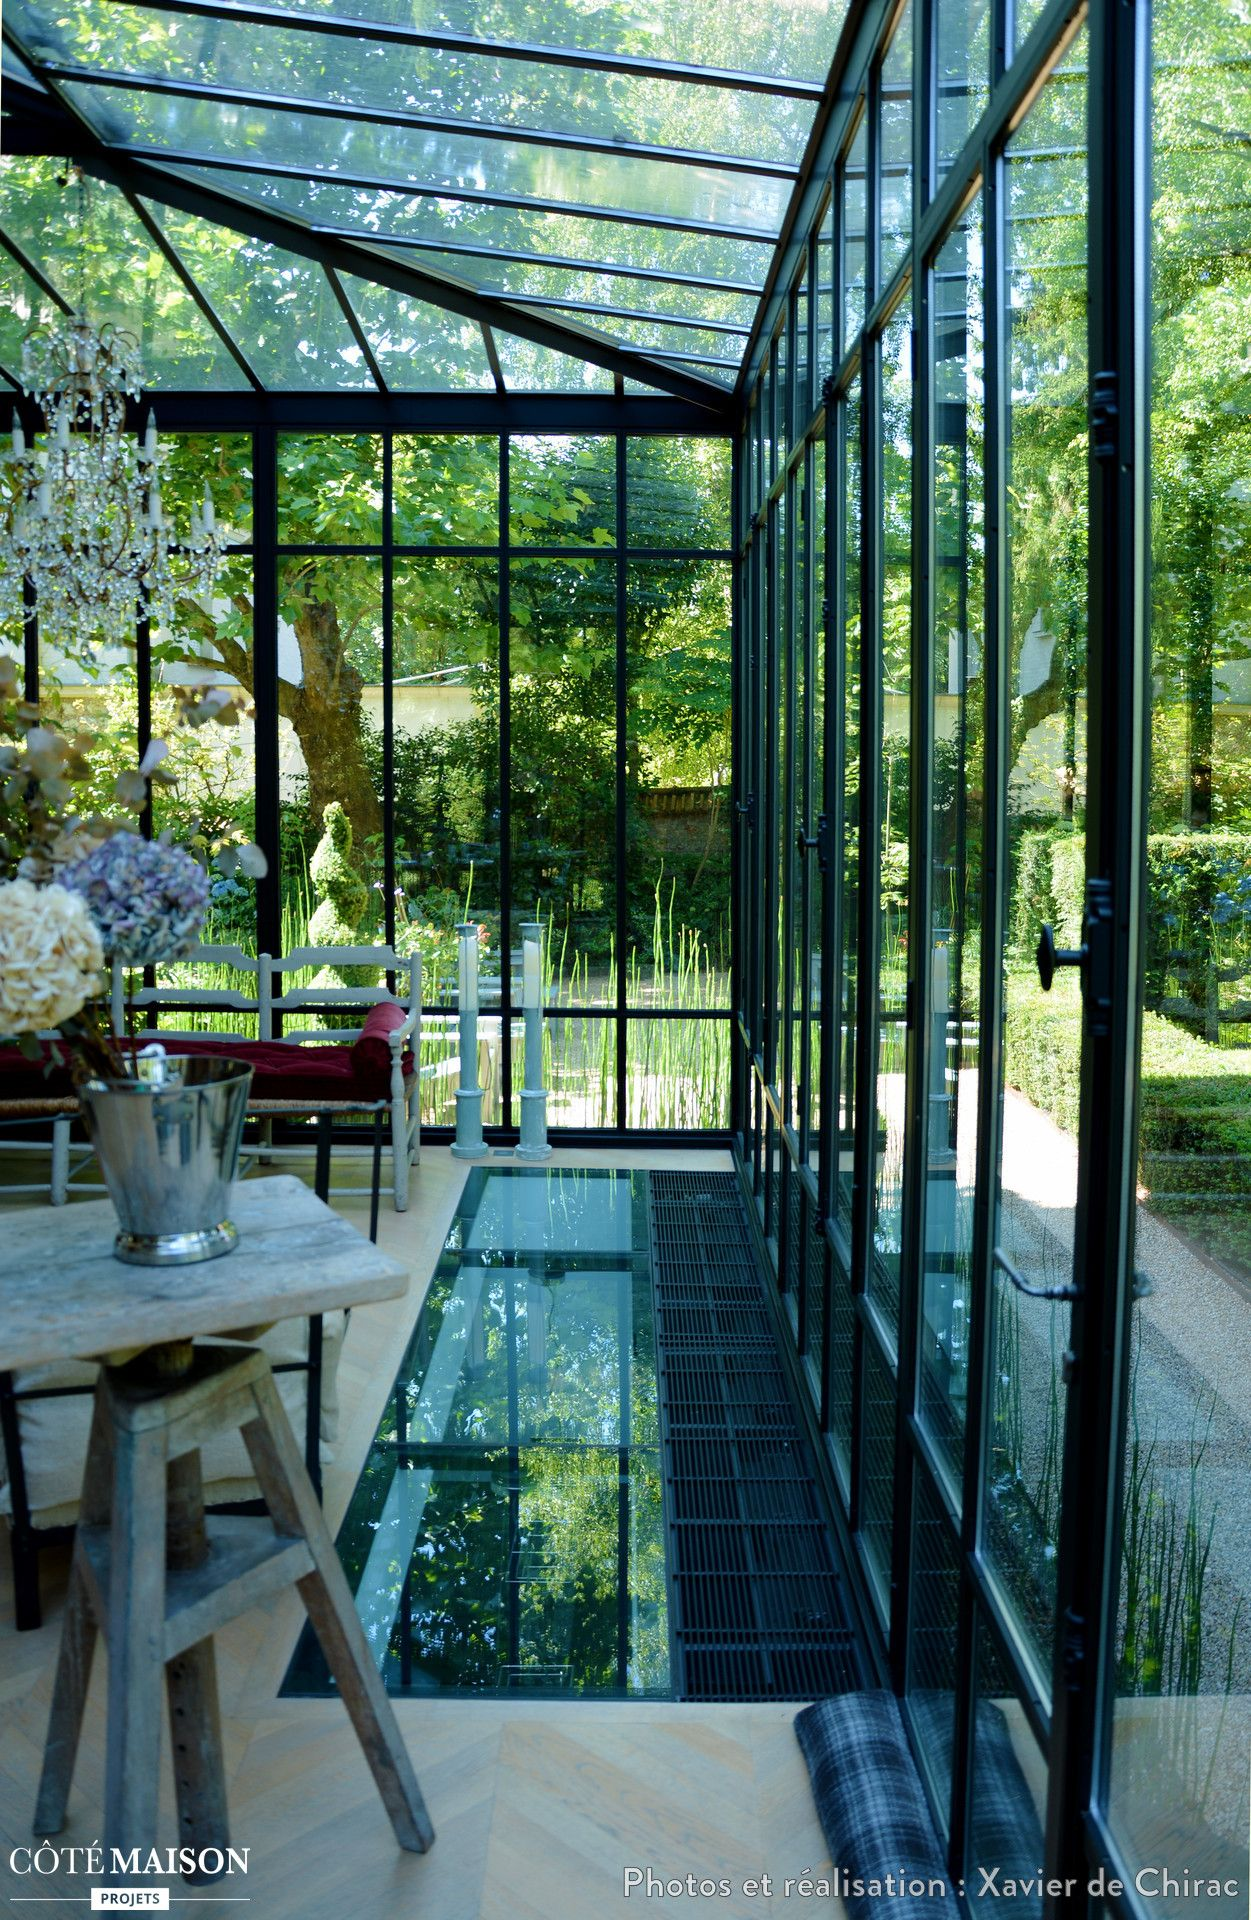 Une v randa luxueuse donne vue sur un jardin luxuriant Verriere jardin